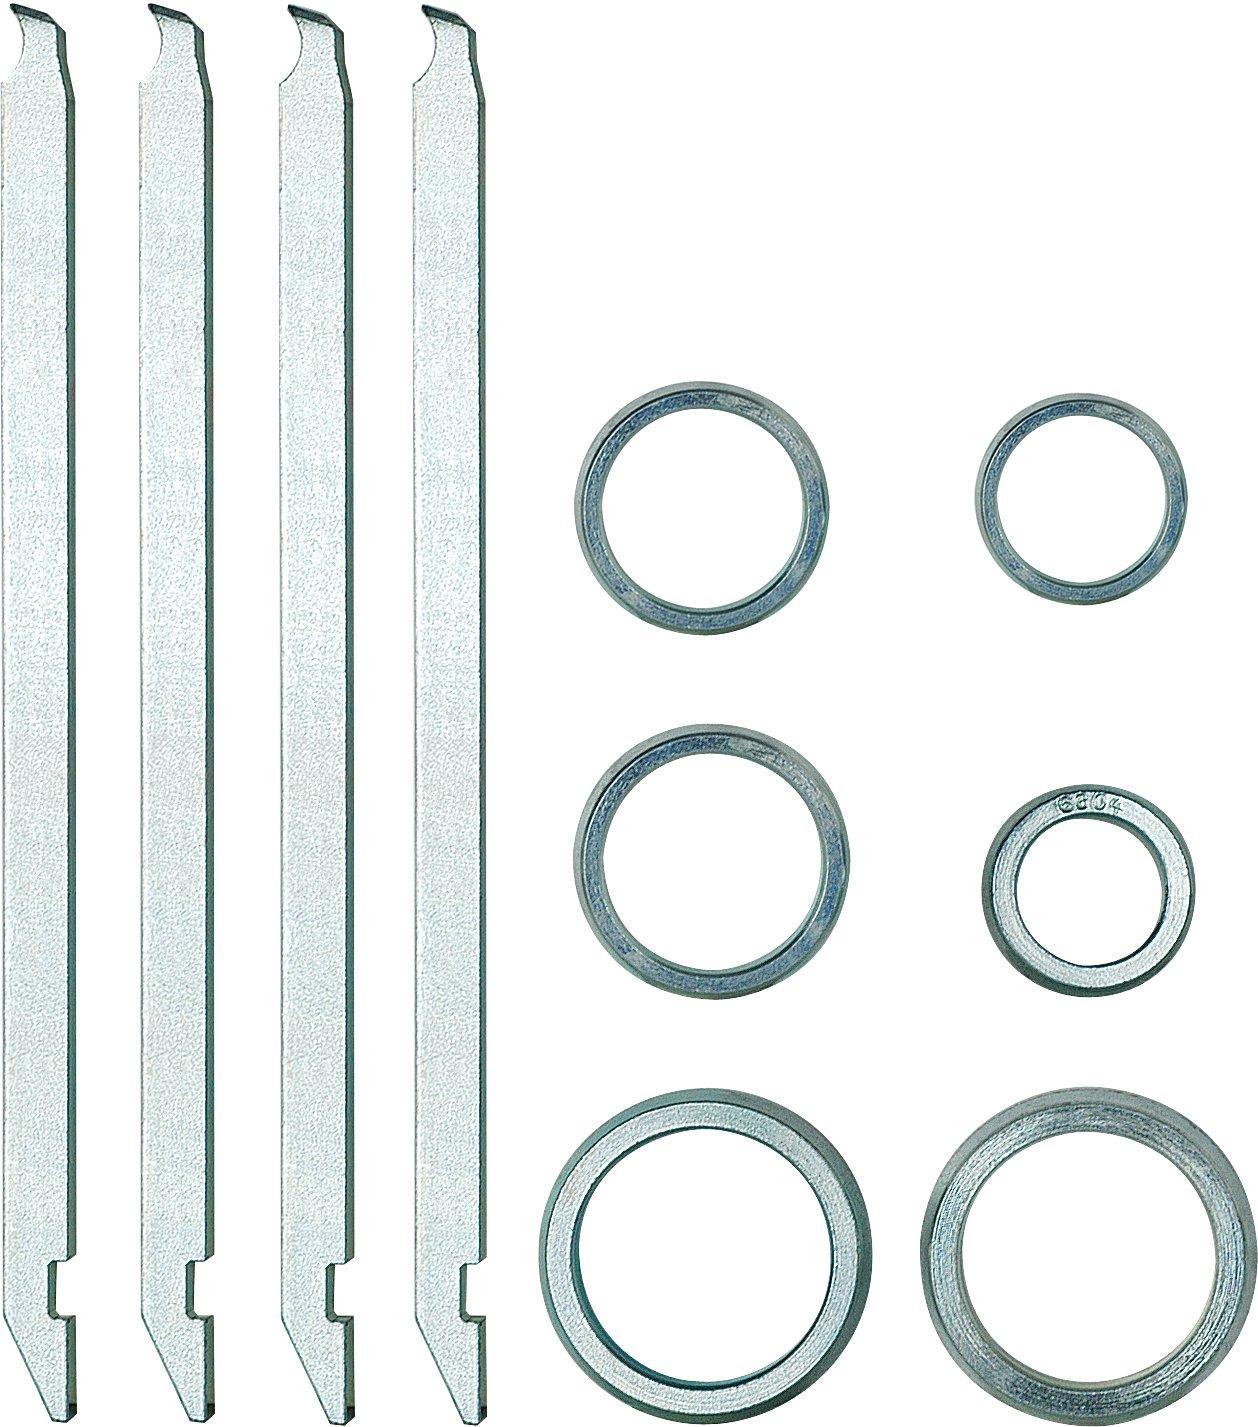 KUKKO 70 Set Pata Innenauszieher 70 – 3 3 3 217 mm mit 9 Ring (4U) a9baae